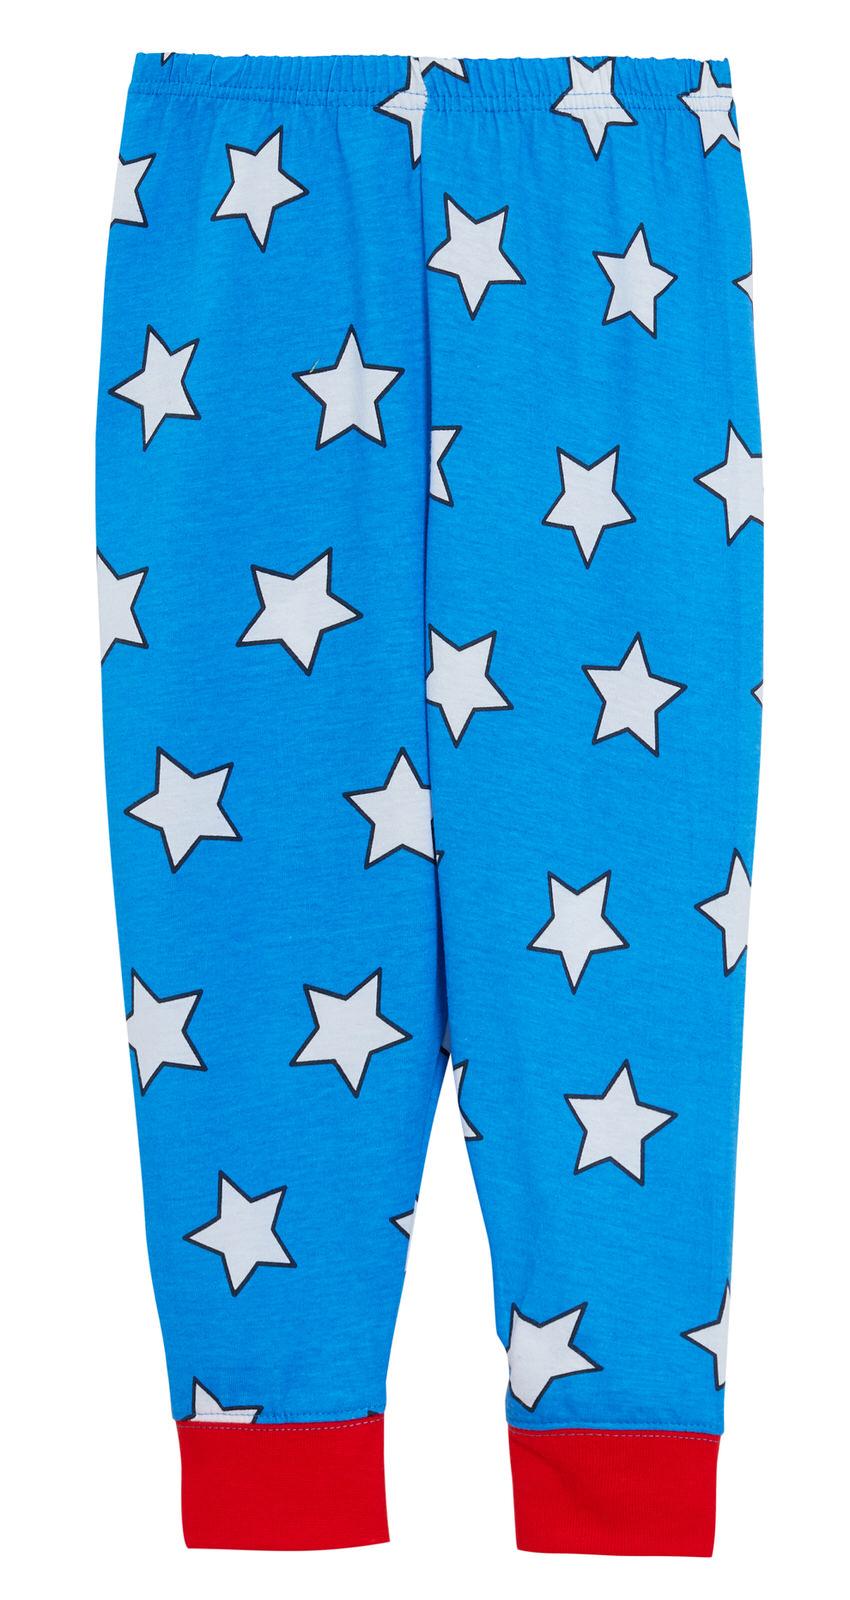 Girls Novelty Wonder Woman Dress Up Pyjamas Kids DC Comics Full Length Pjs 9-10